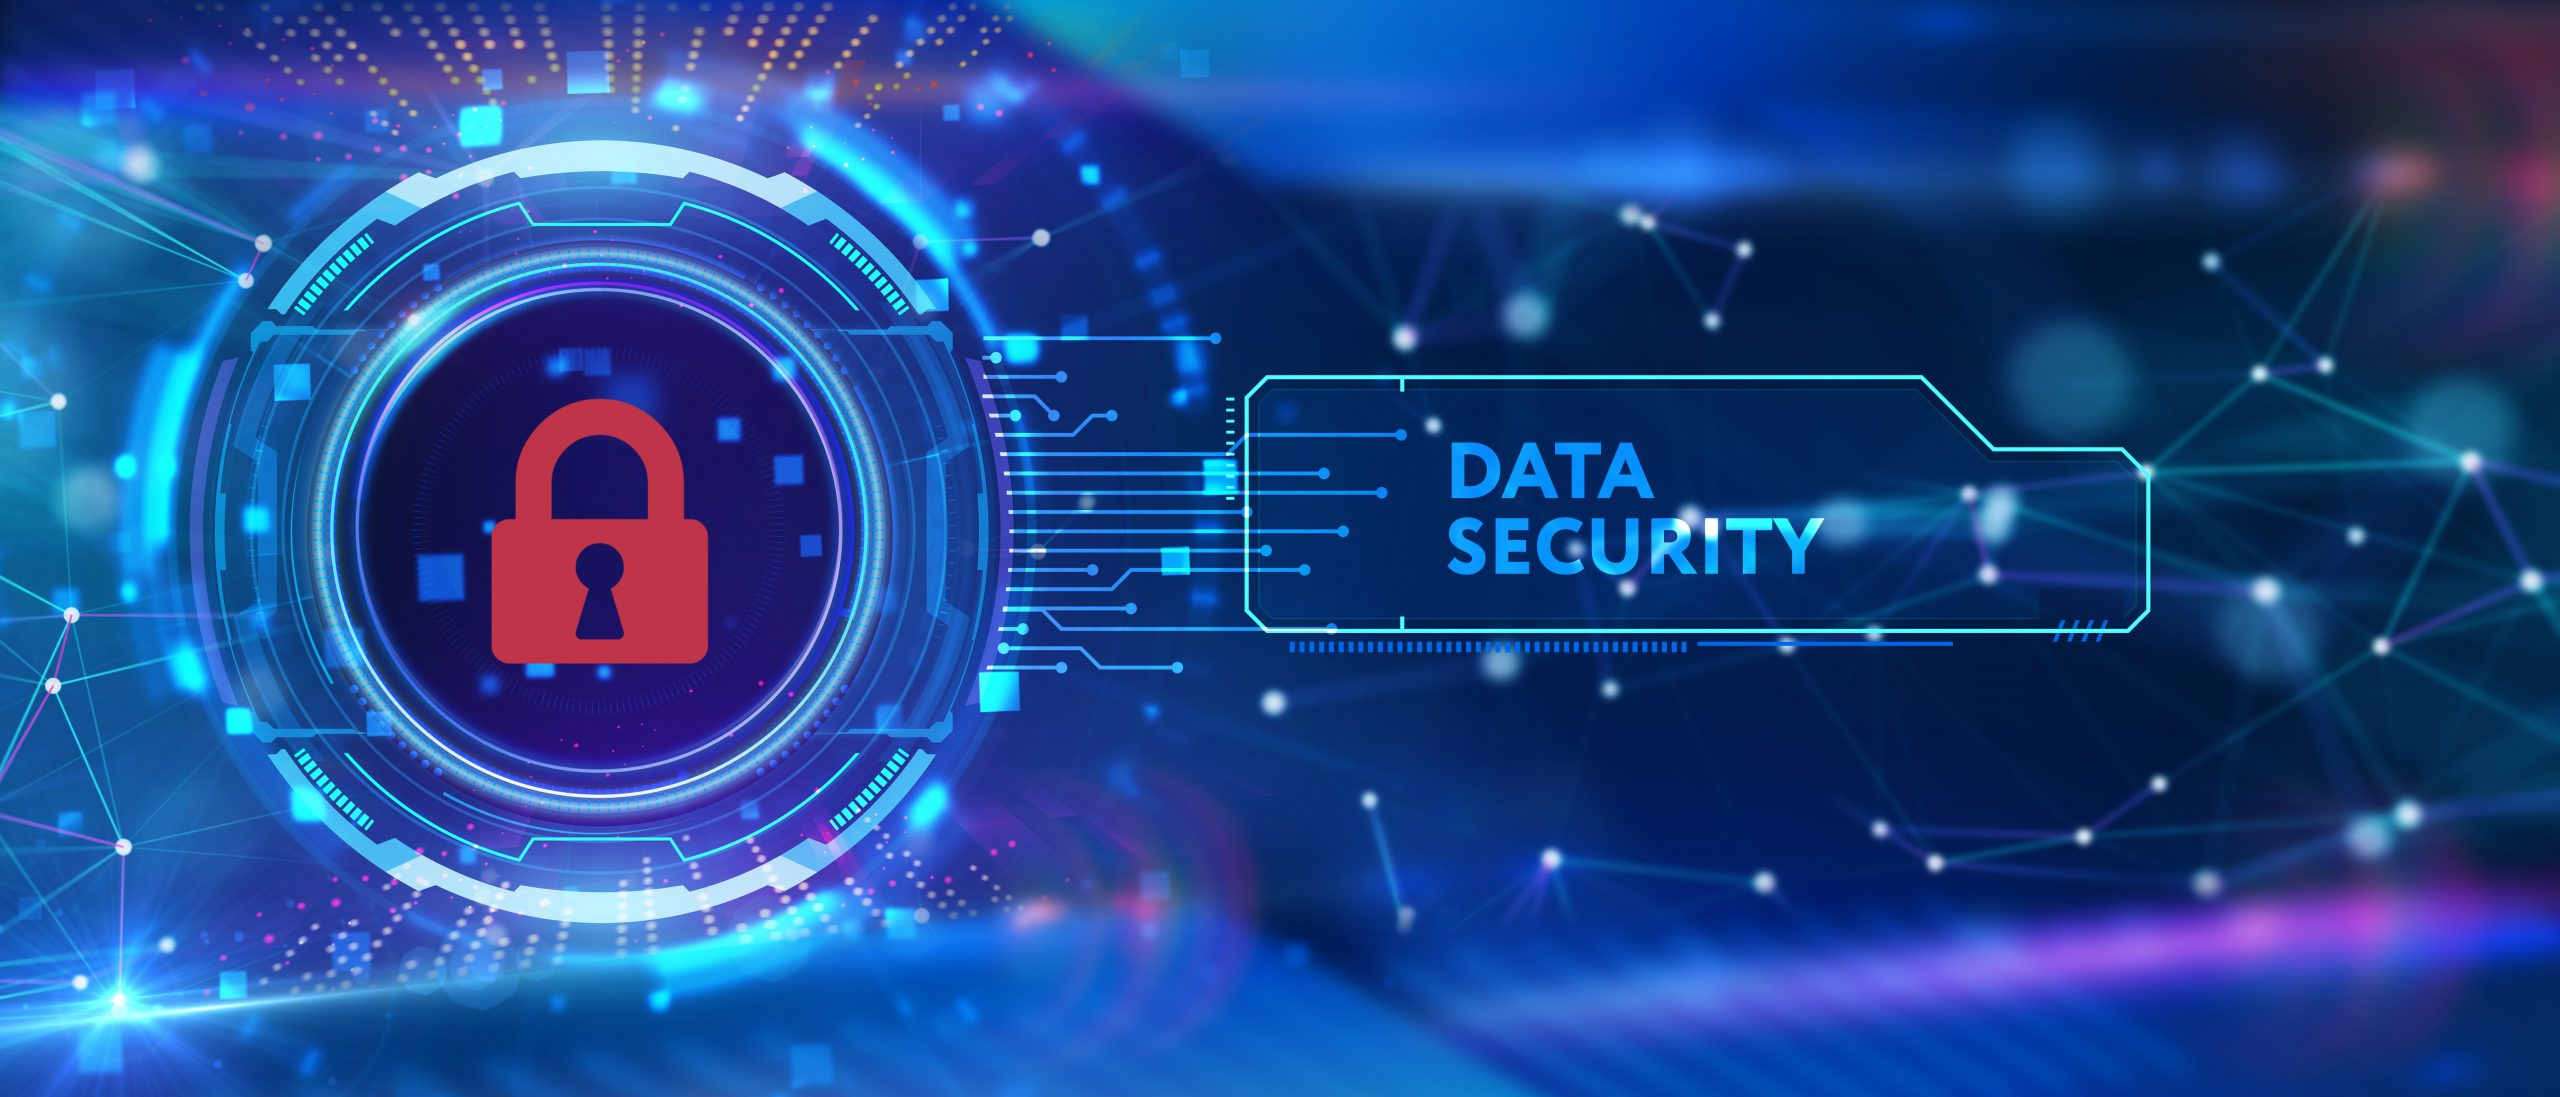 Data Security: Understanding the Threat Part 4